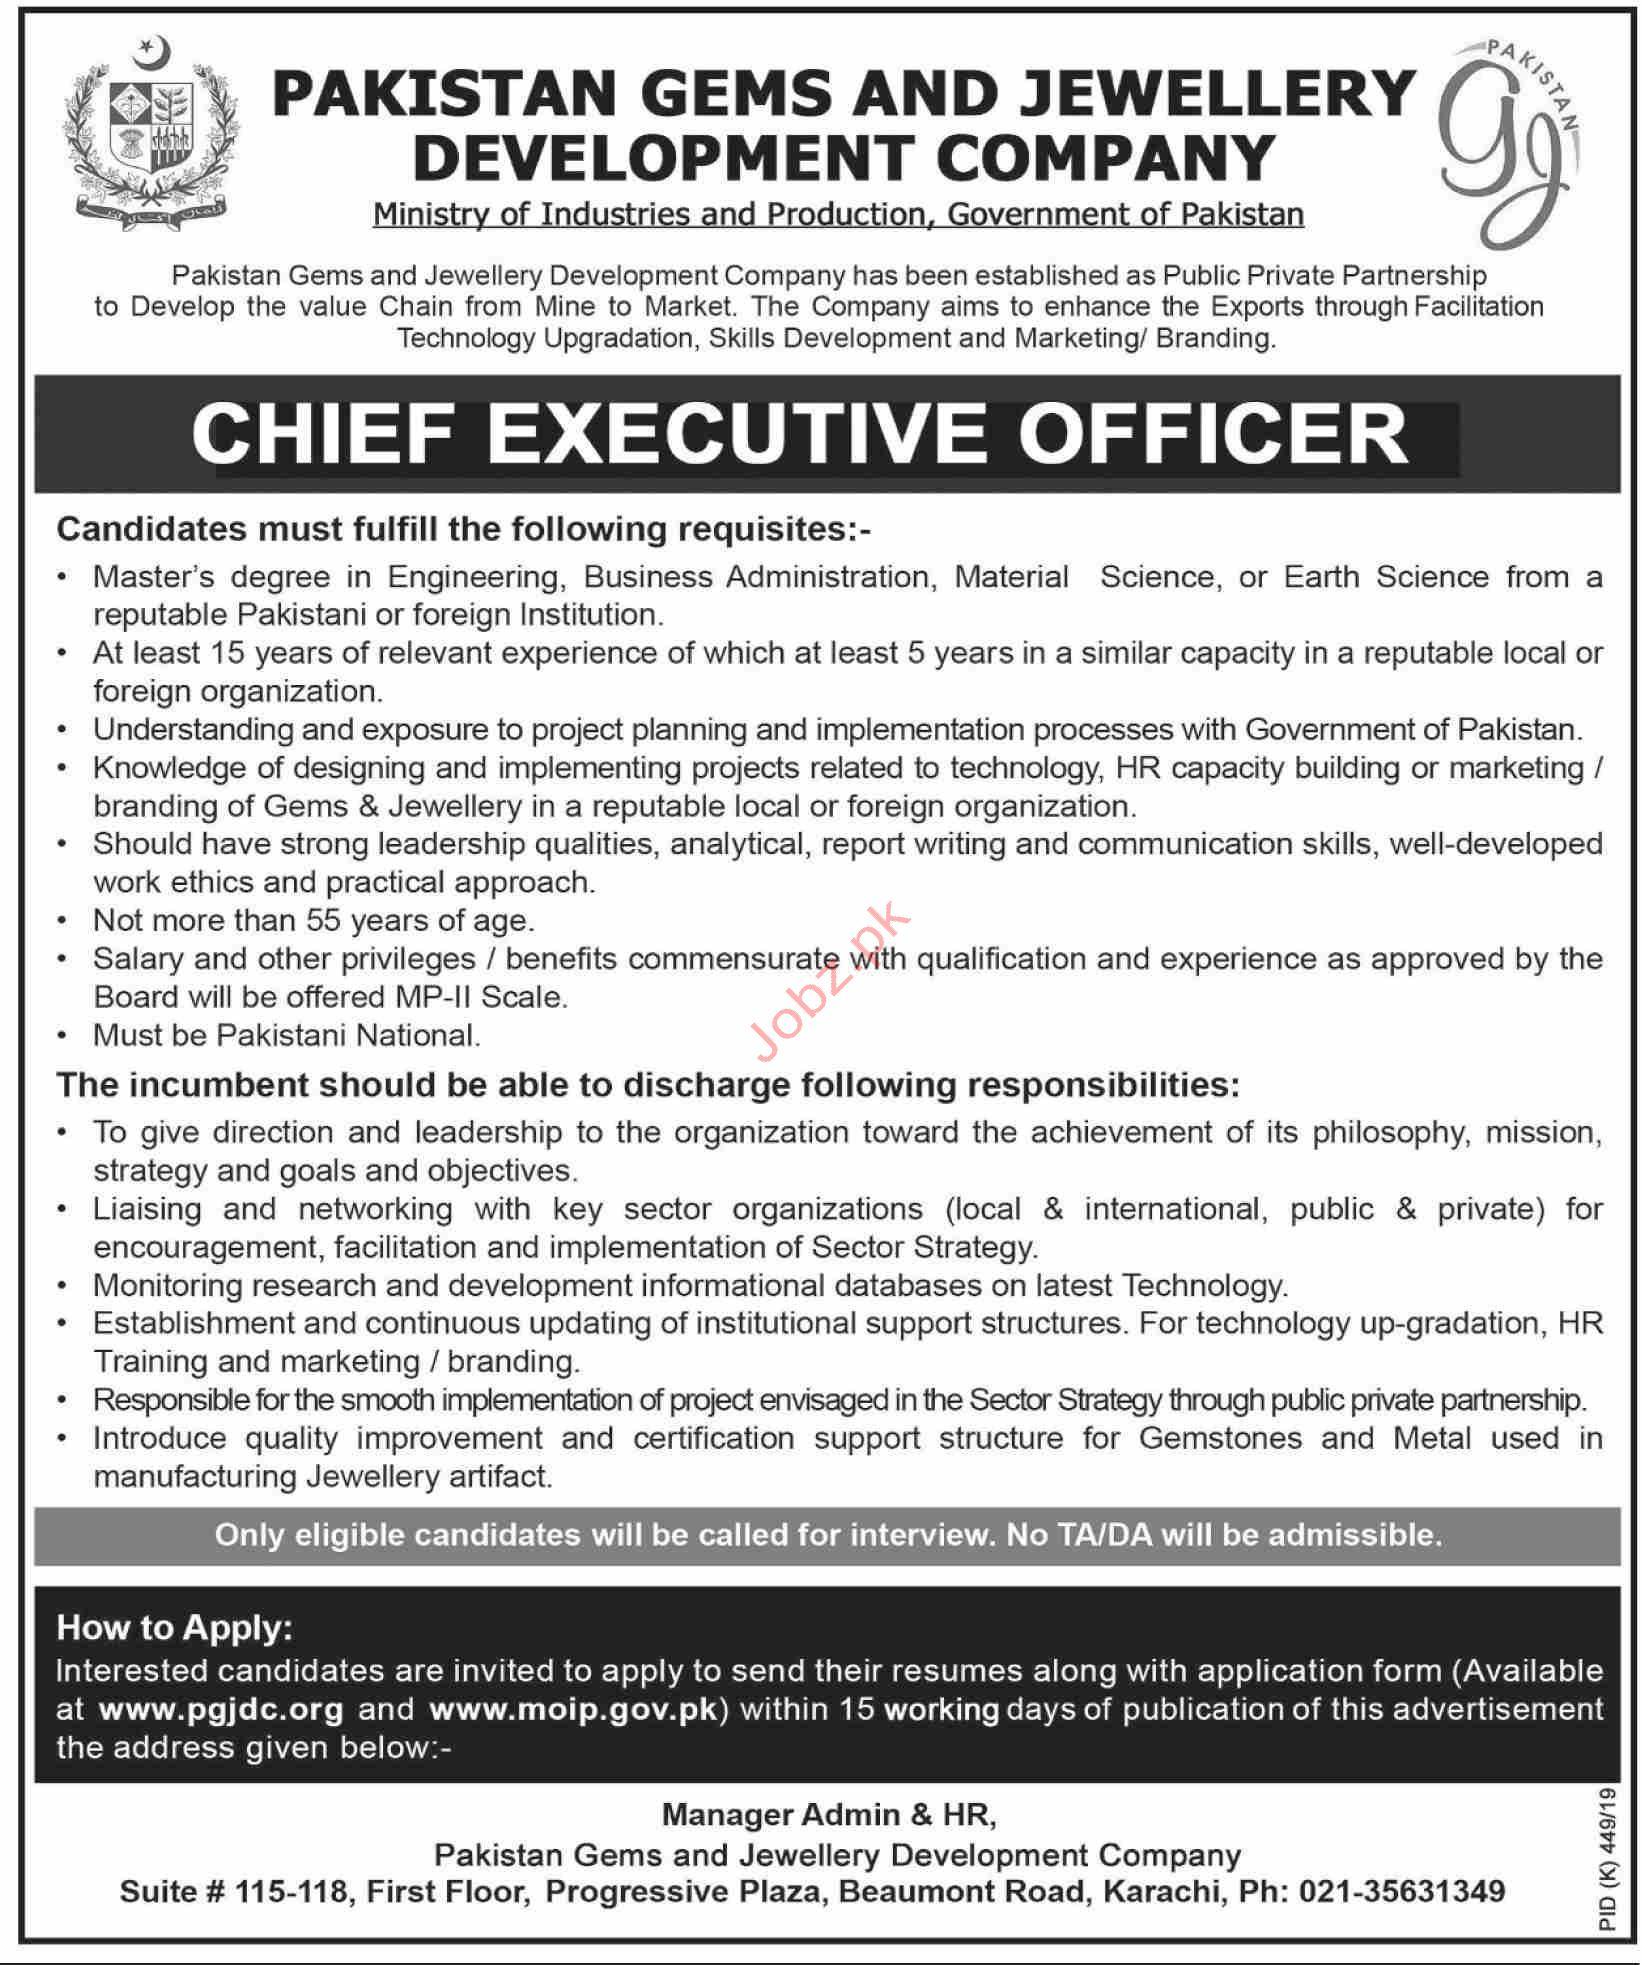 Pakistan Gems and Jewelry Development Company 2019 Job Advertisement